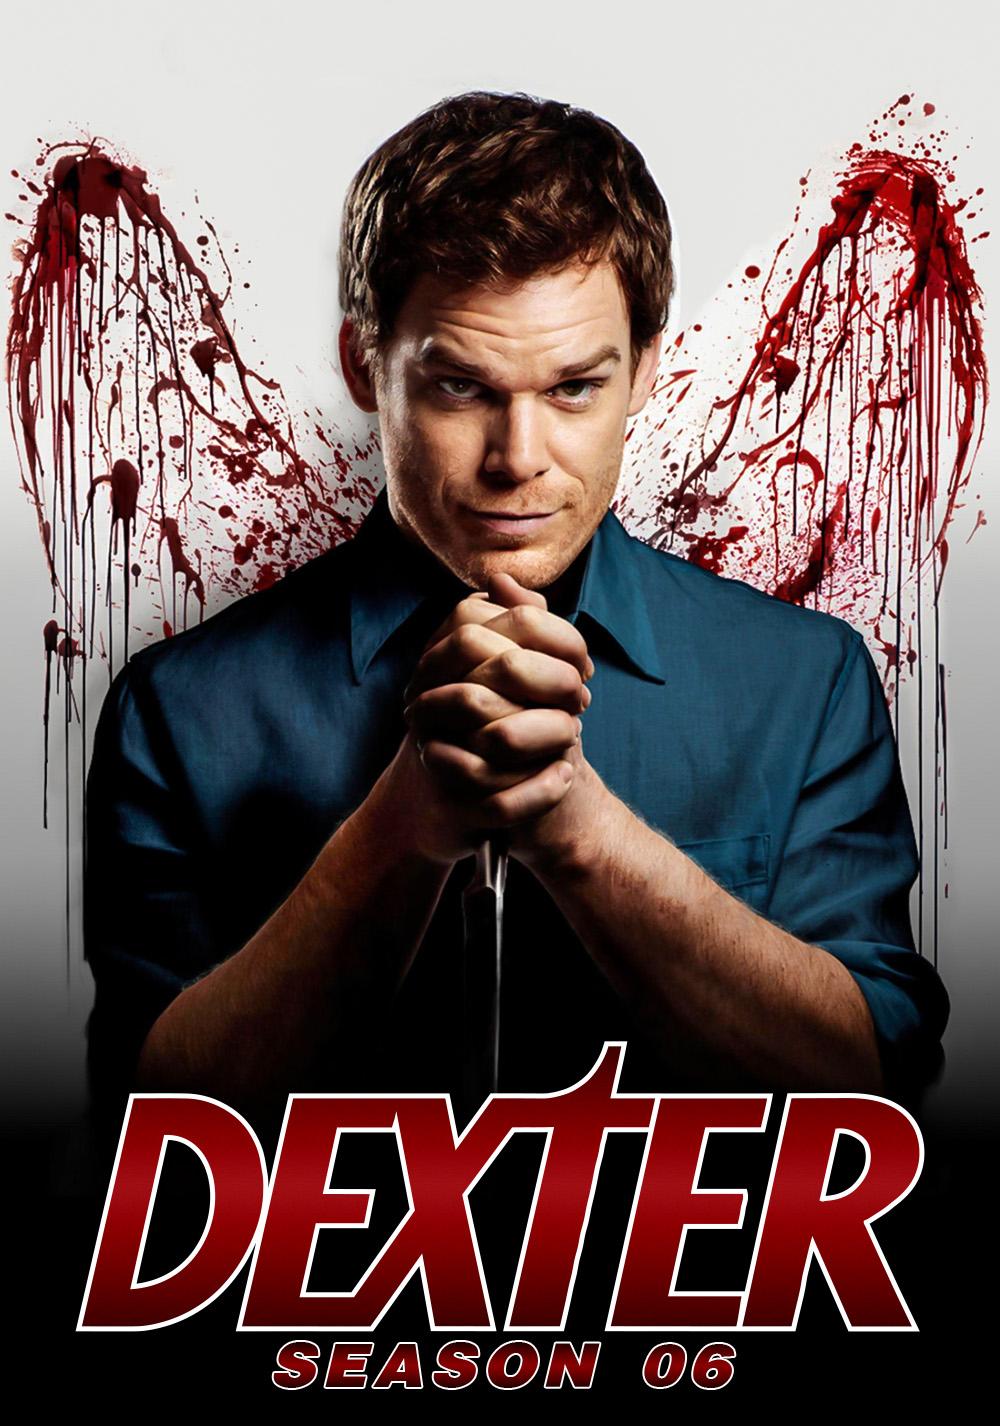 Dexter|Colección 1-8|Latino-Ingles|1080p|96/96|x265 10bit|+ Soundtracks  Season06-poster